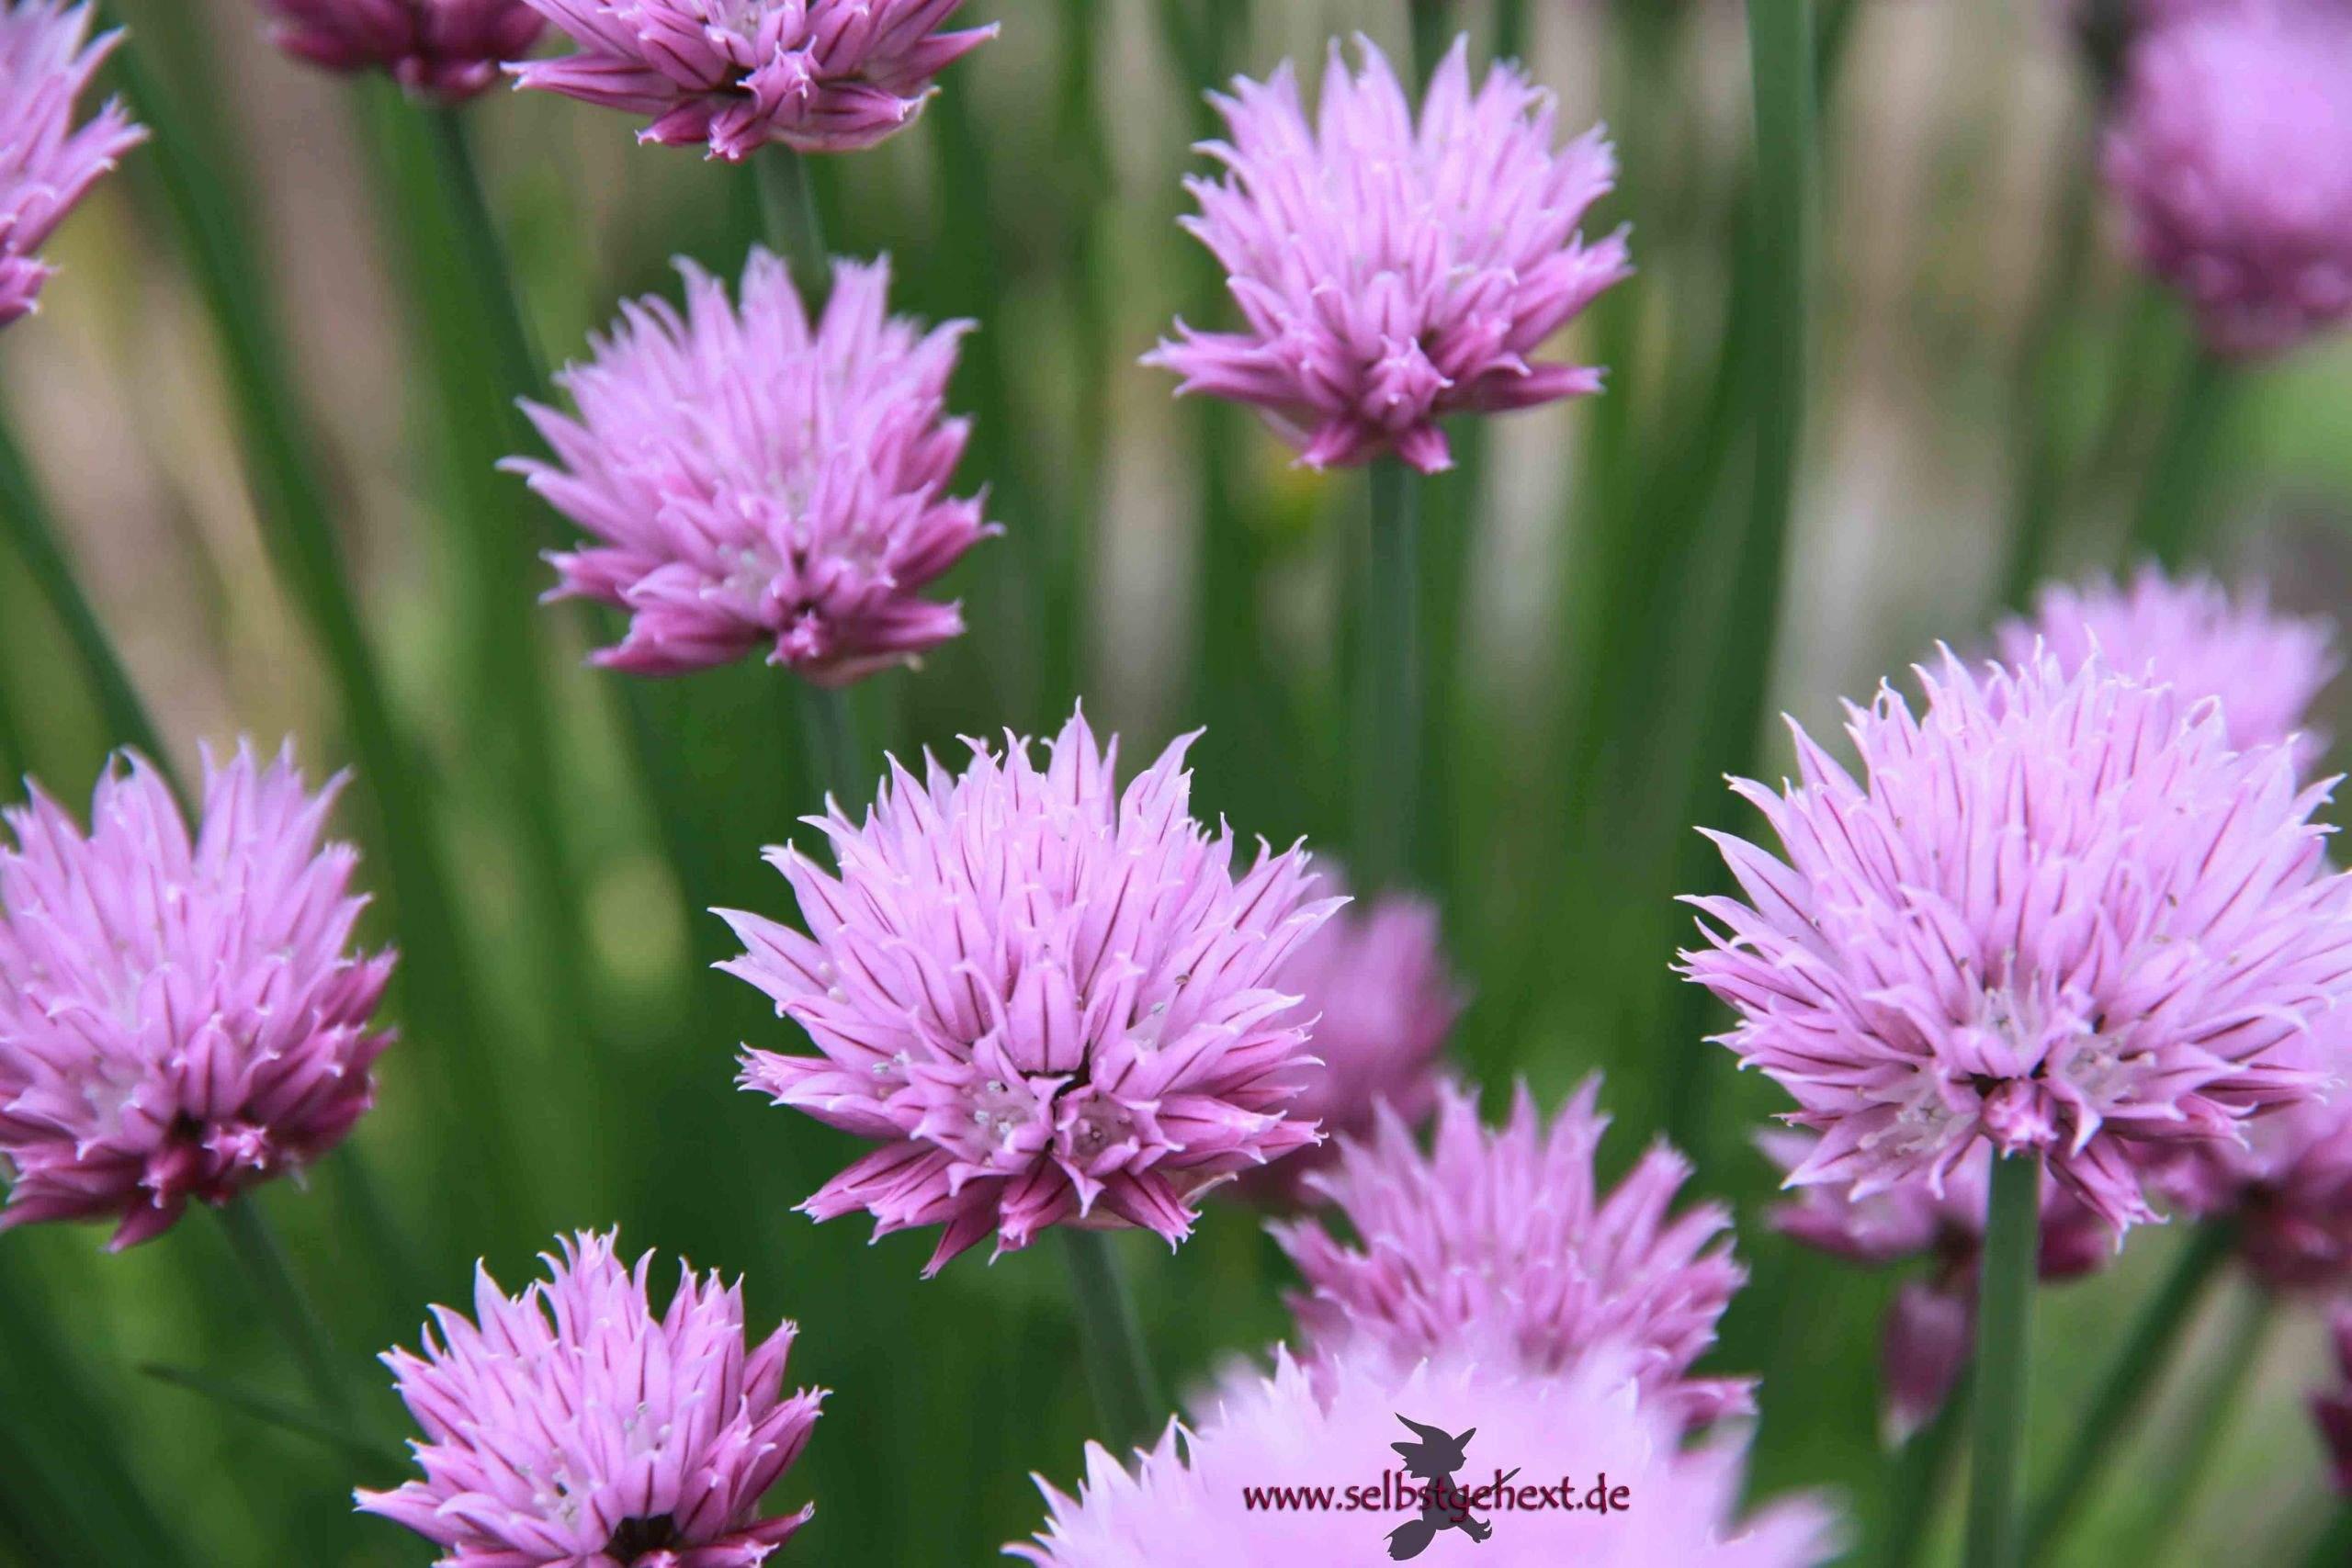 garten ringelblume genial schnittlauchbluten fruhlingsessig of garten ringelblume scaled